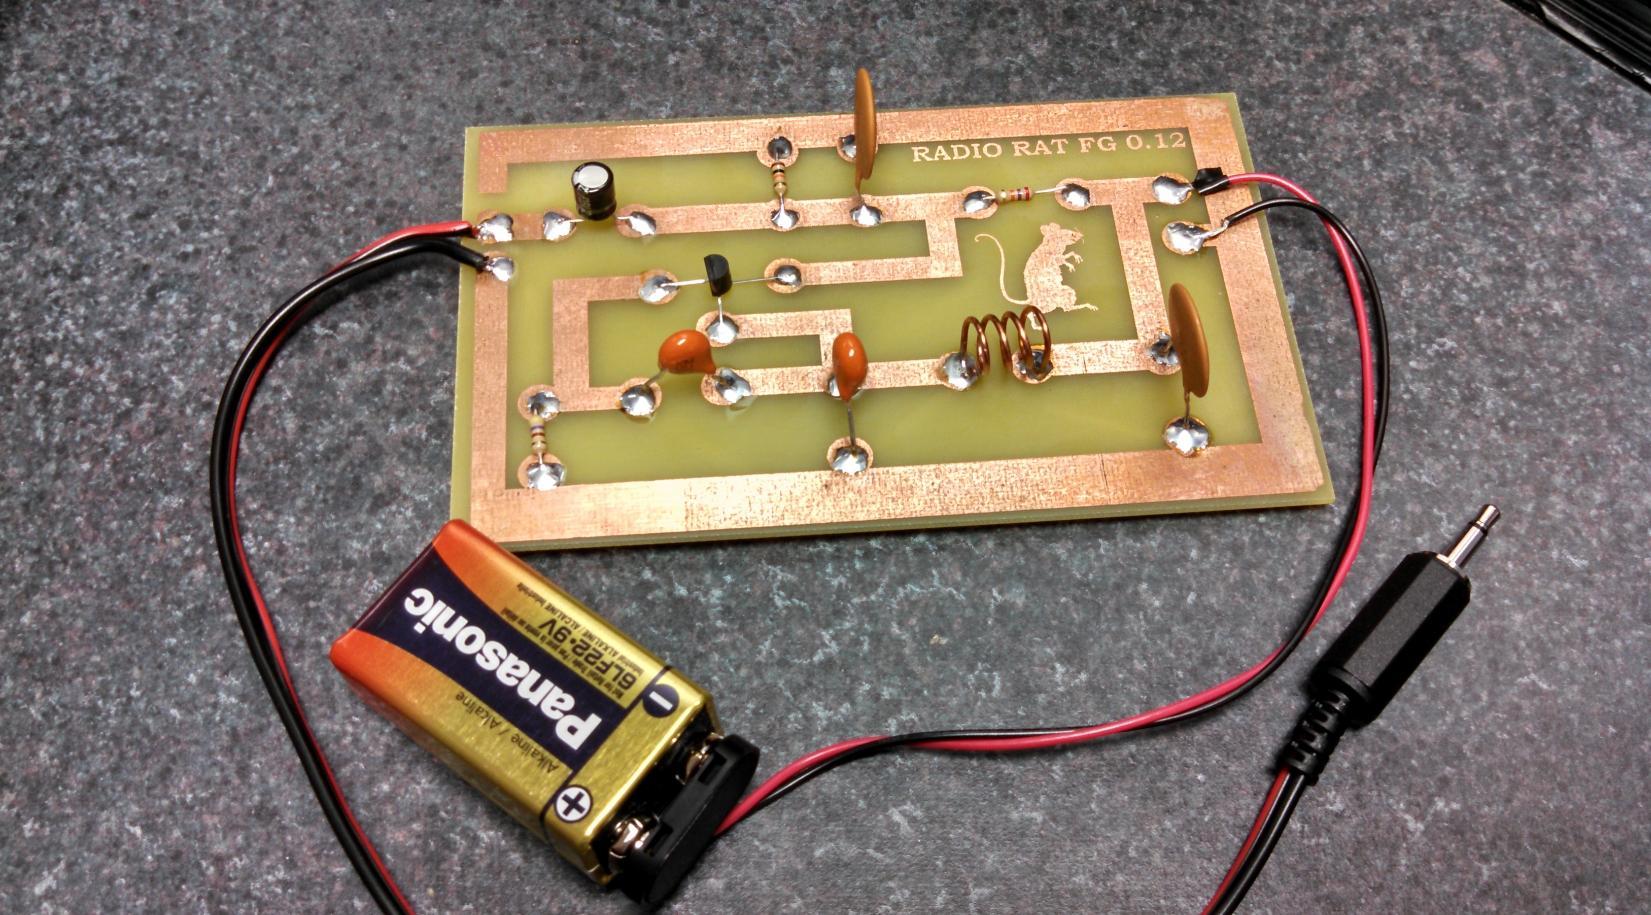 Diy phone jammer homemade - make phone jammer detector